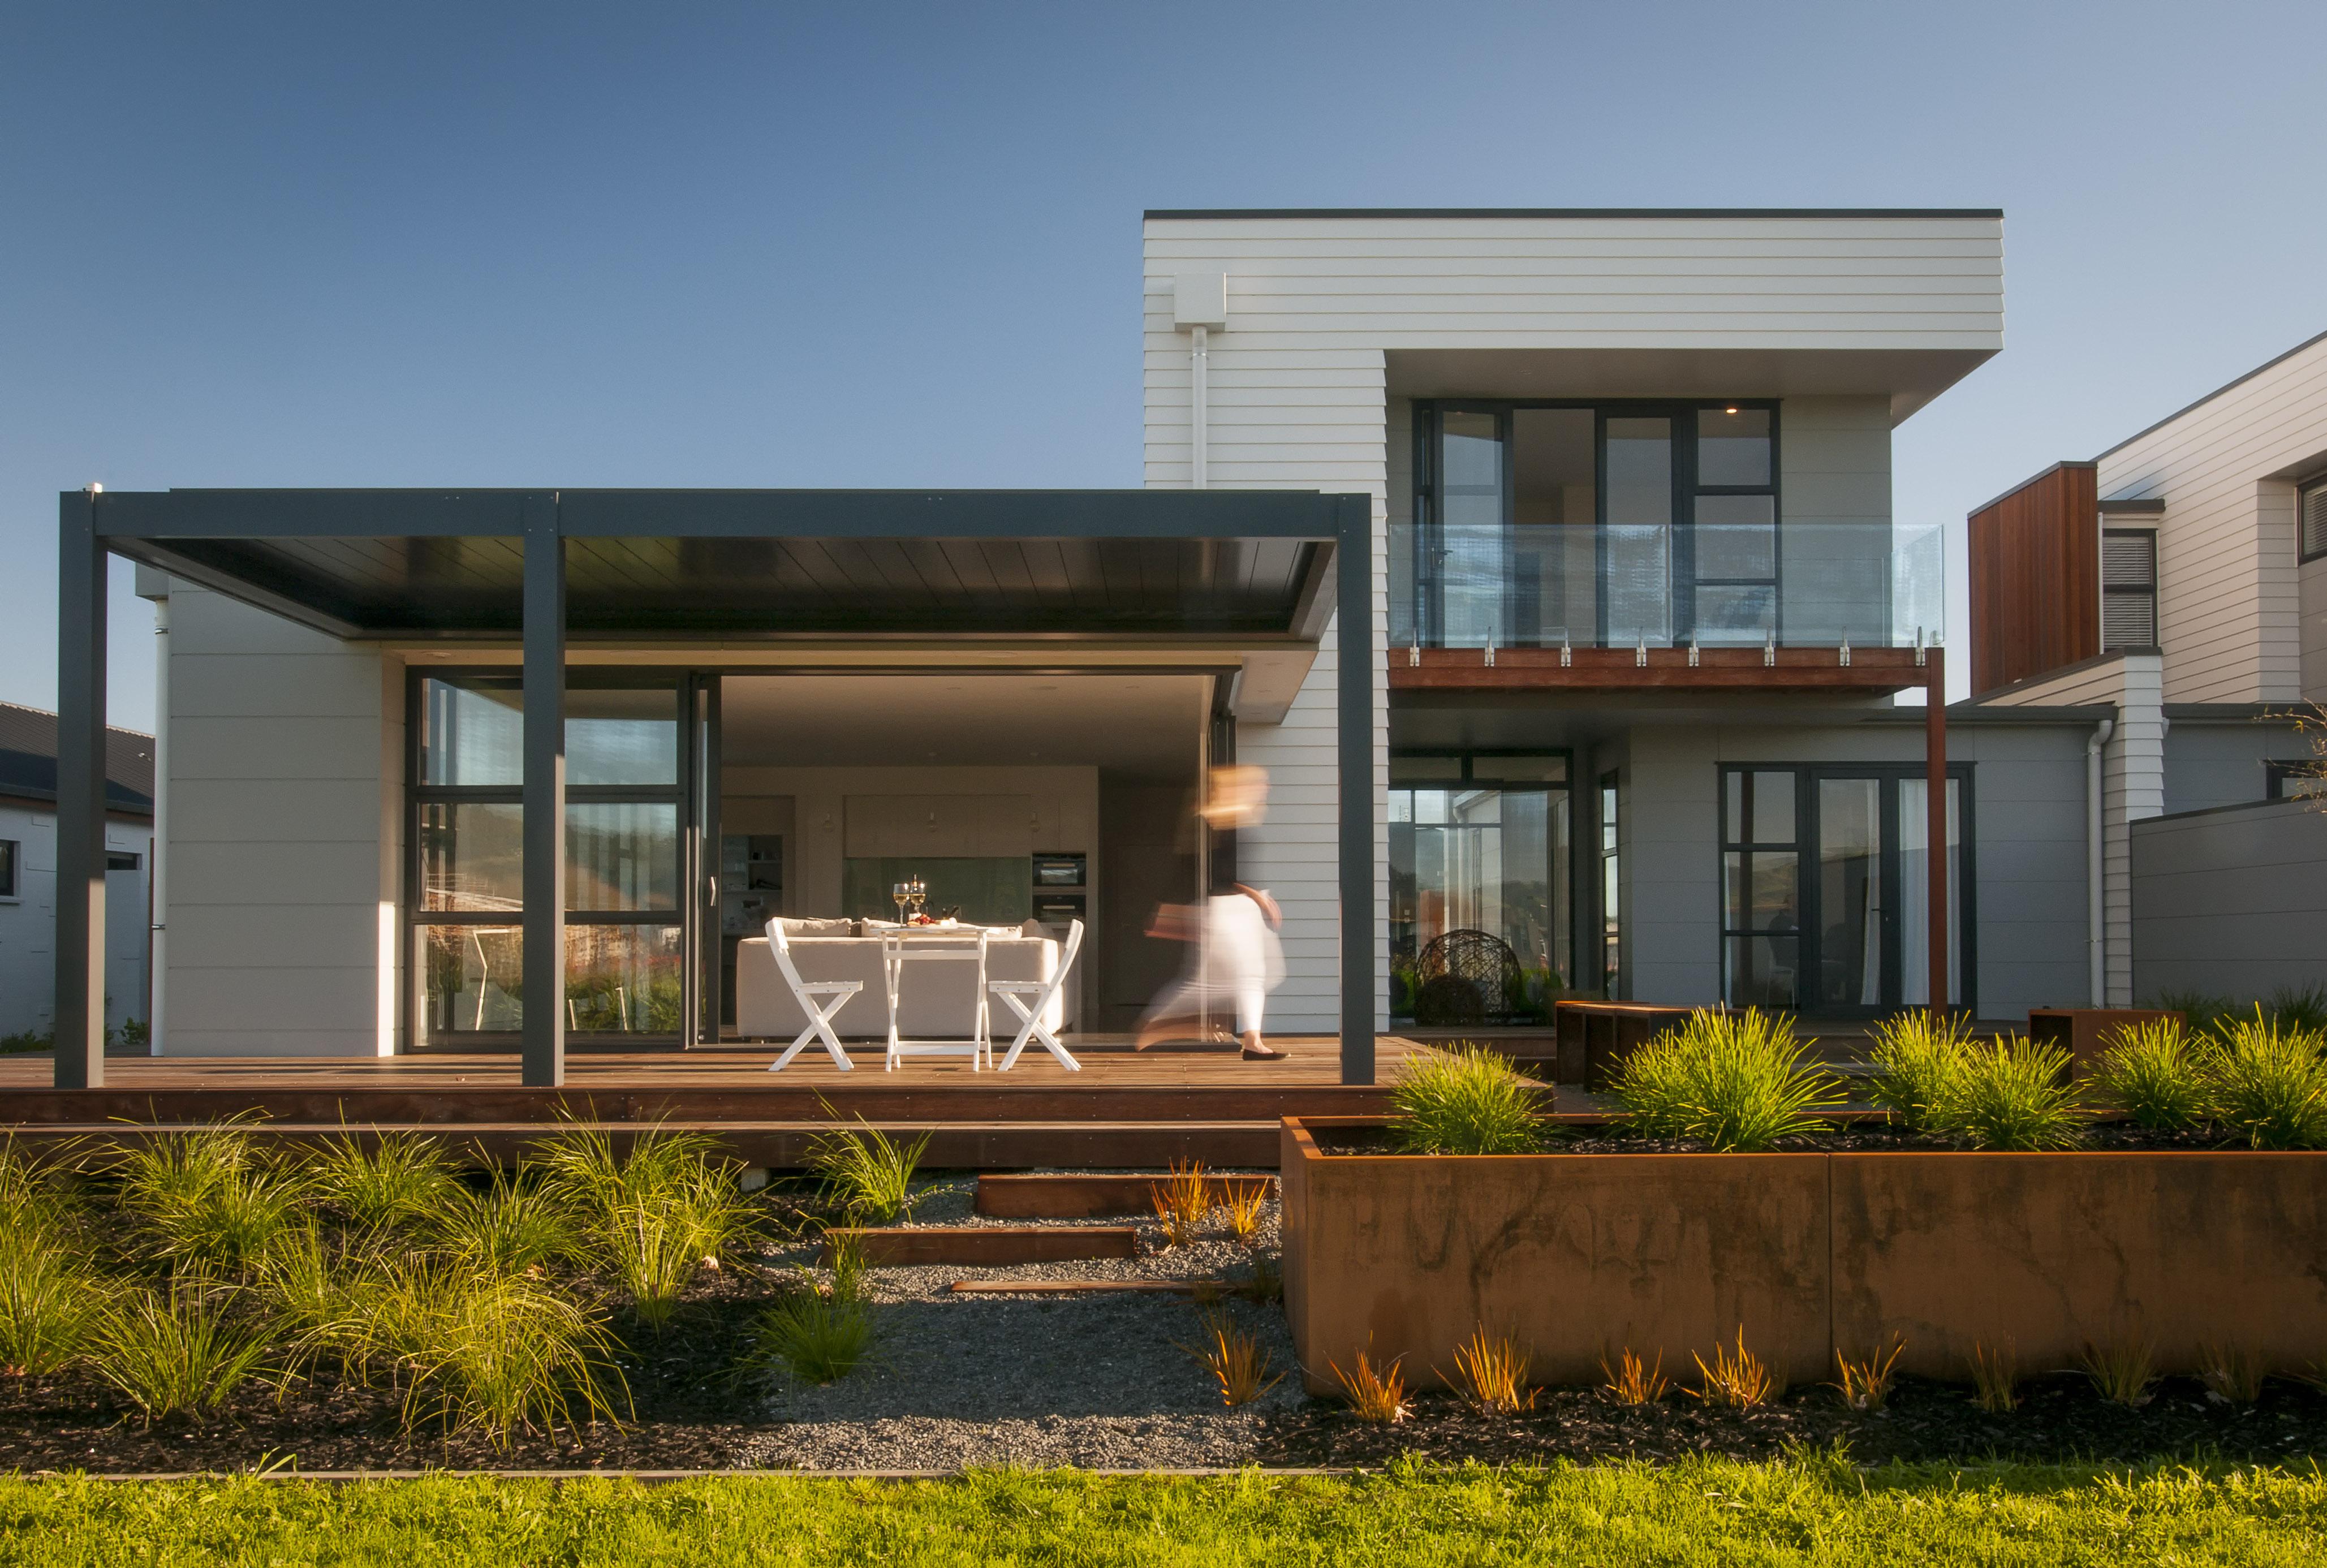 James hardie delivers multi clad appeal for st kilda homes for Hardiplank homes designs